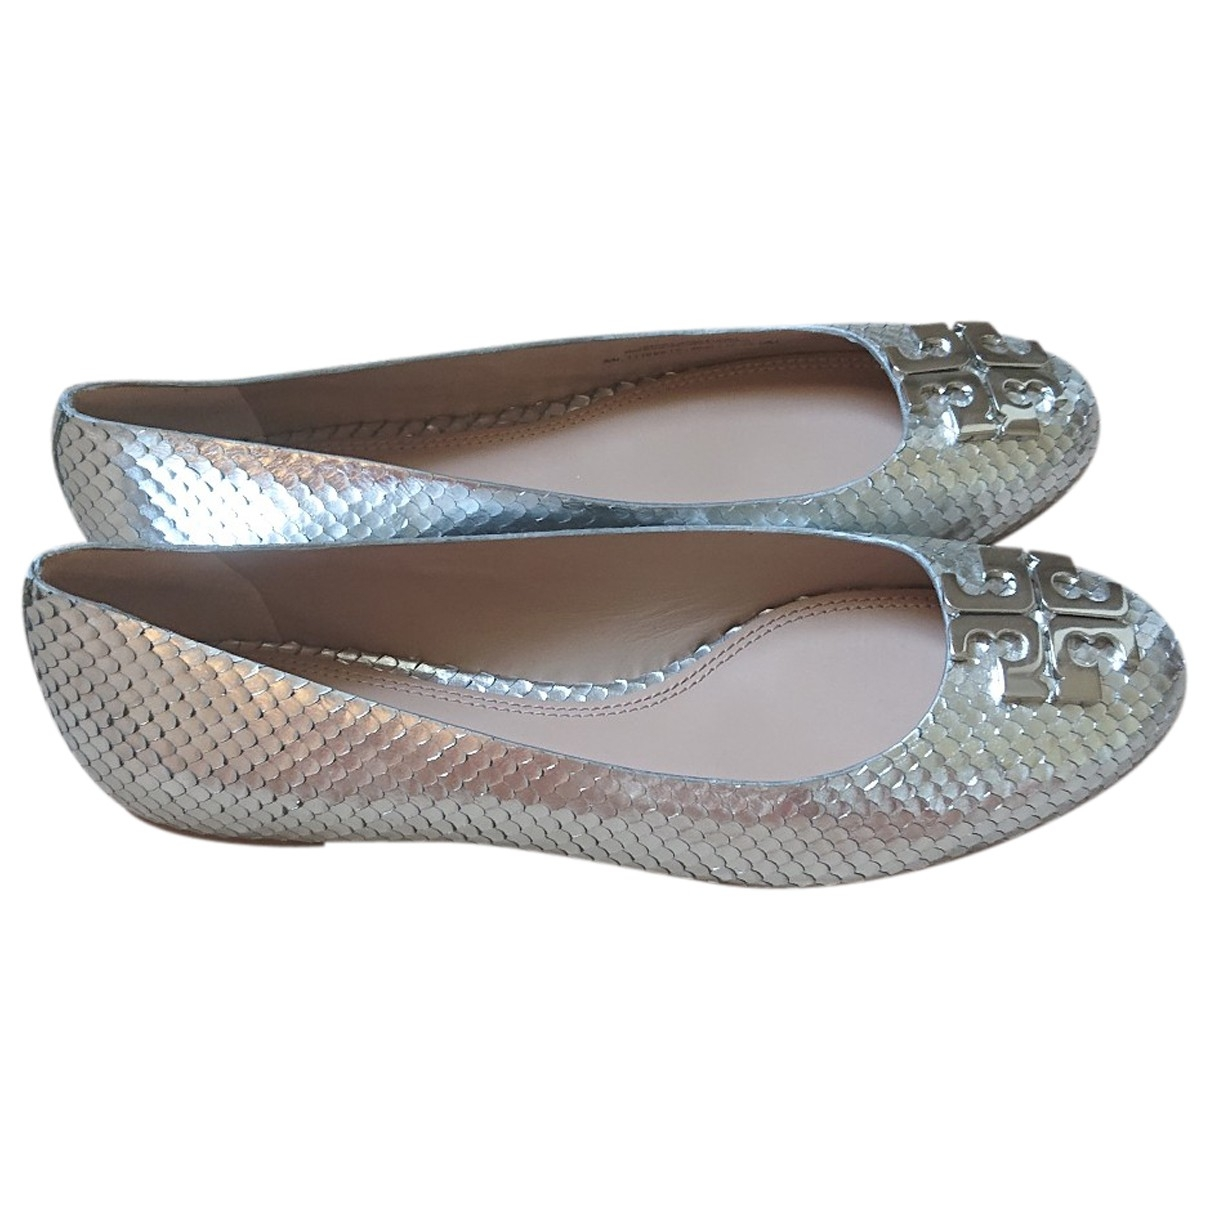 Tory Burch \N Silver Leather Ballet flats for Women 39 EU